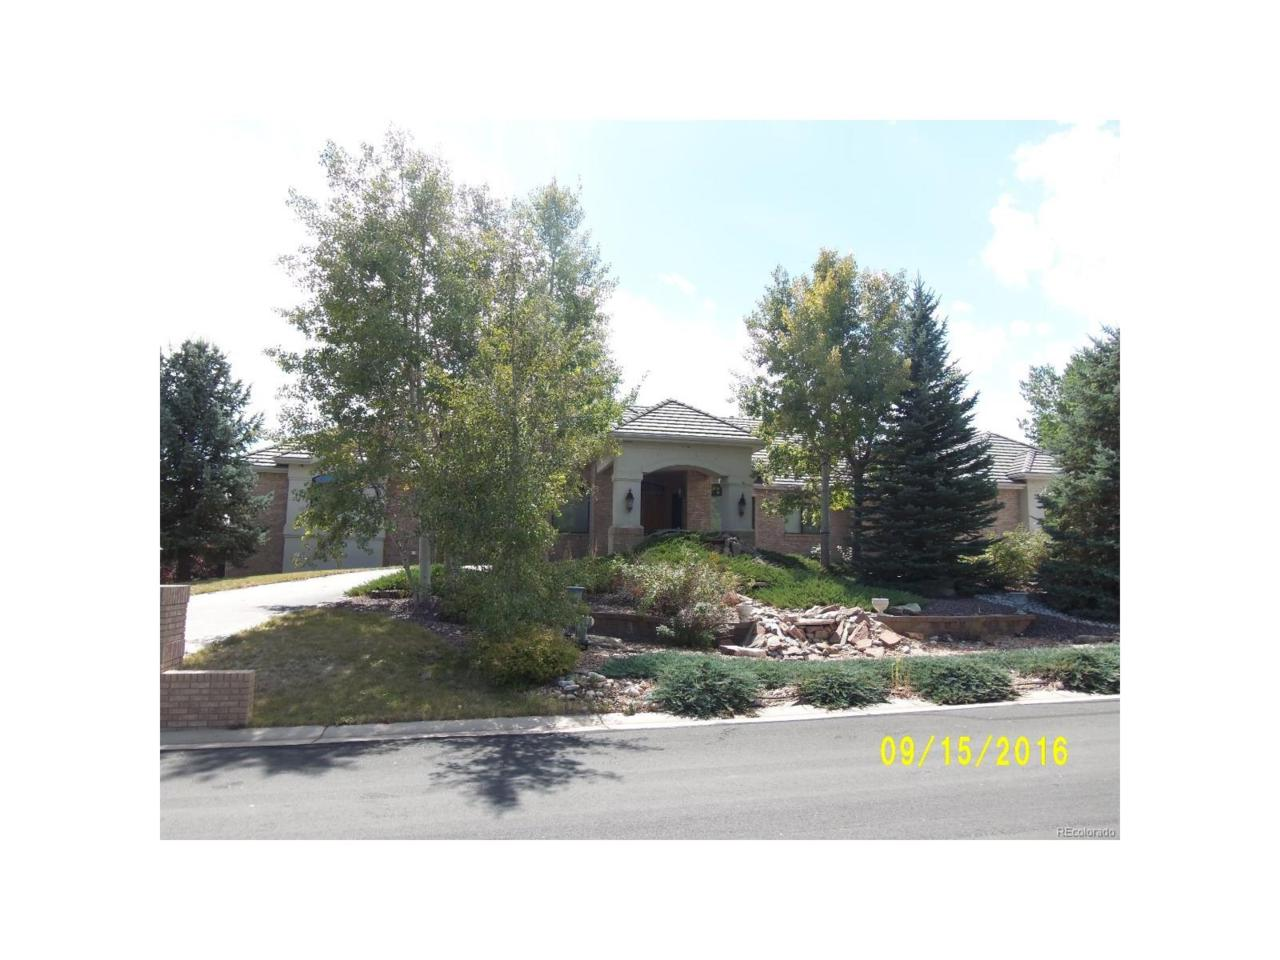 14034 Lexington Circle, Westminster, CO 80023 (MLS #1930115) :: 8z Real Estate